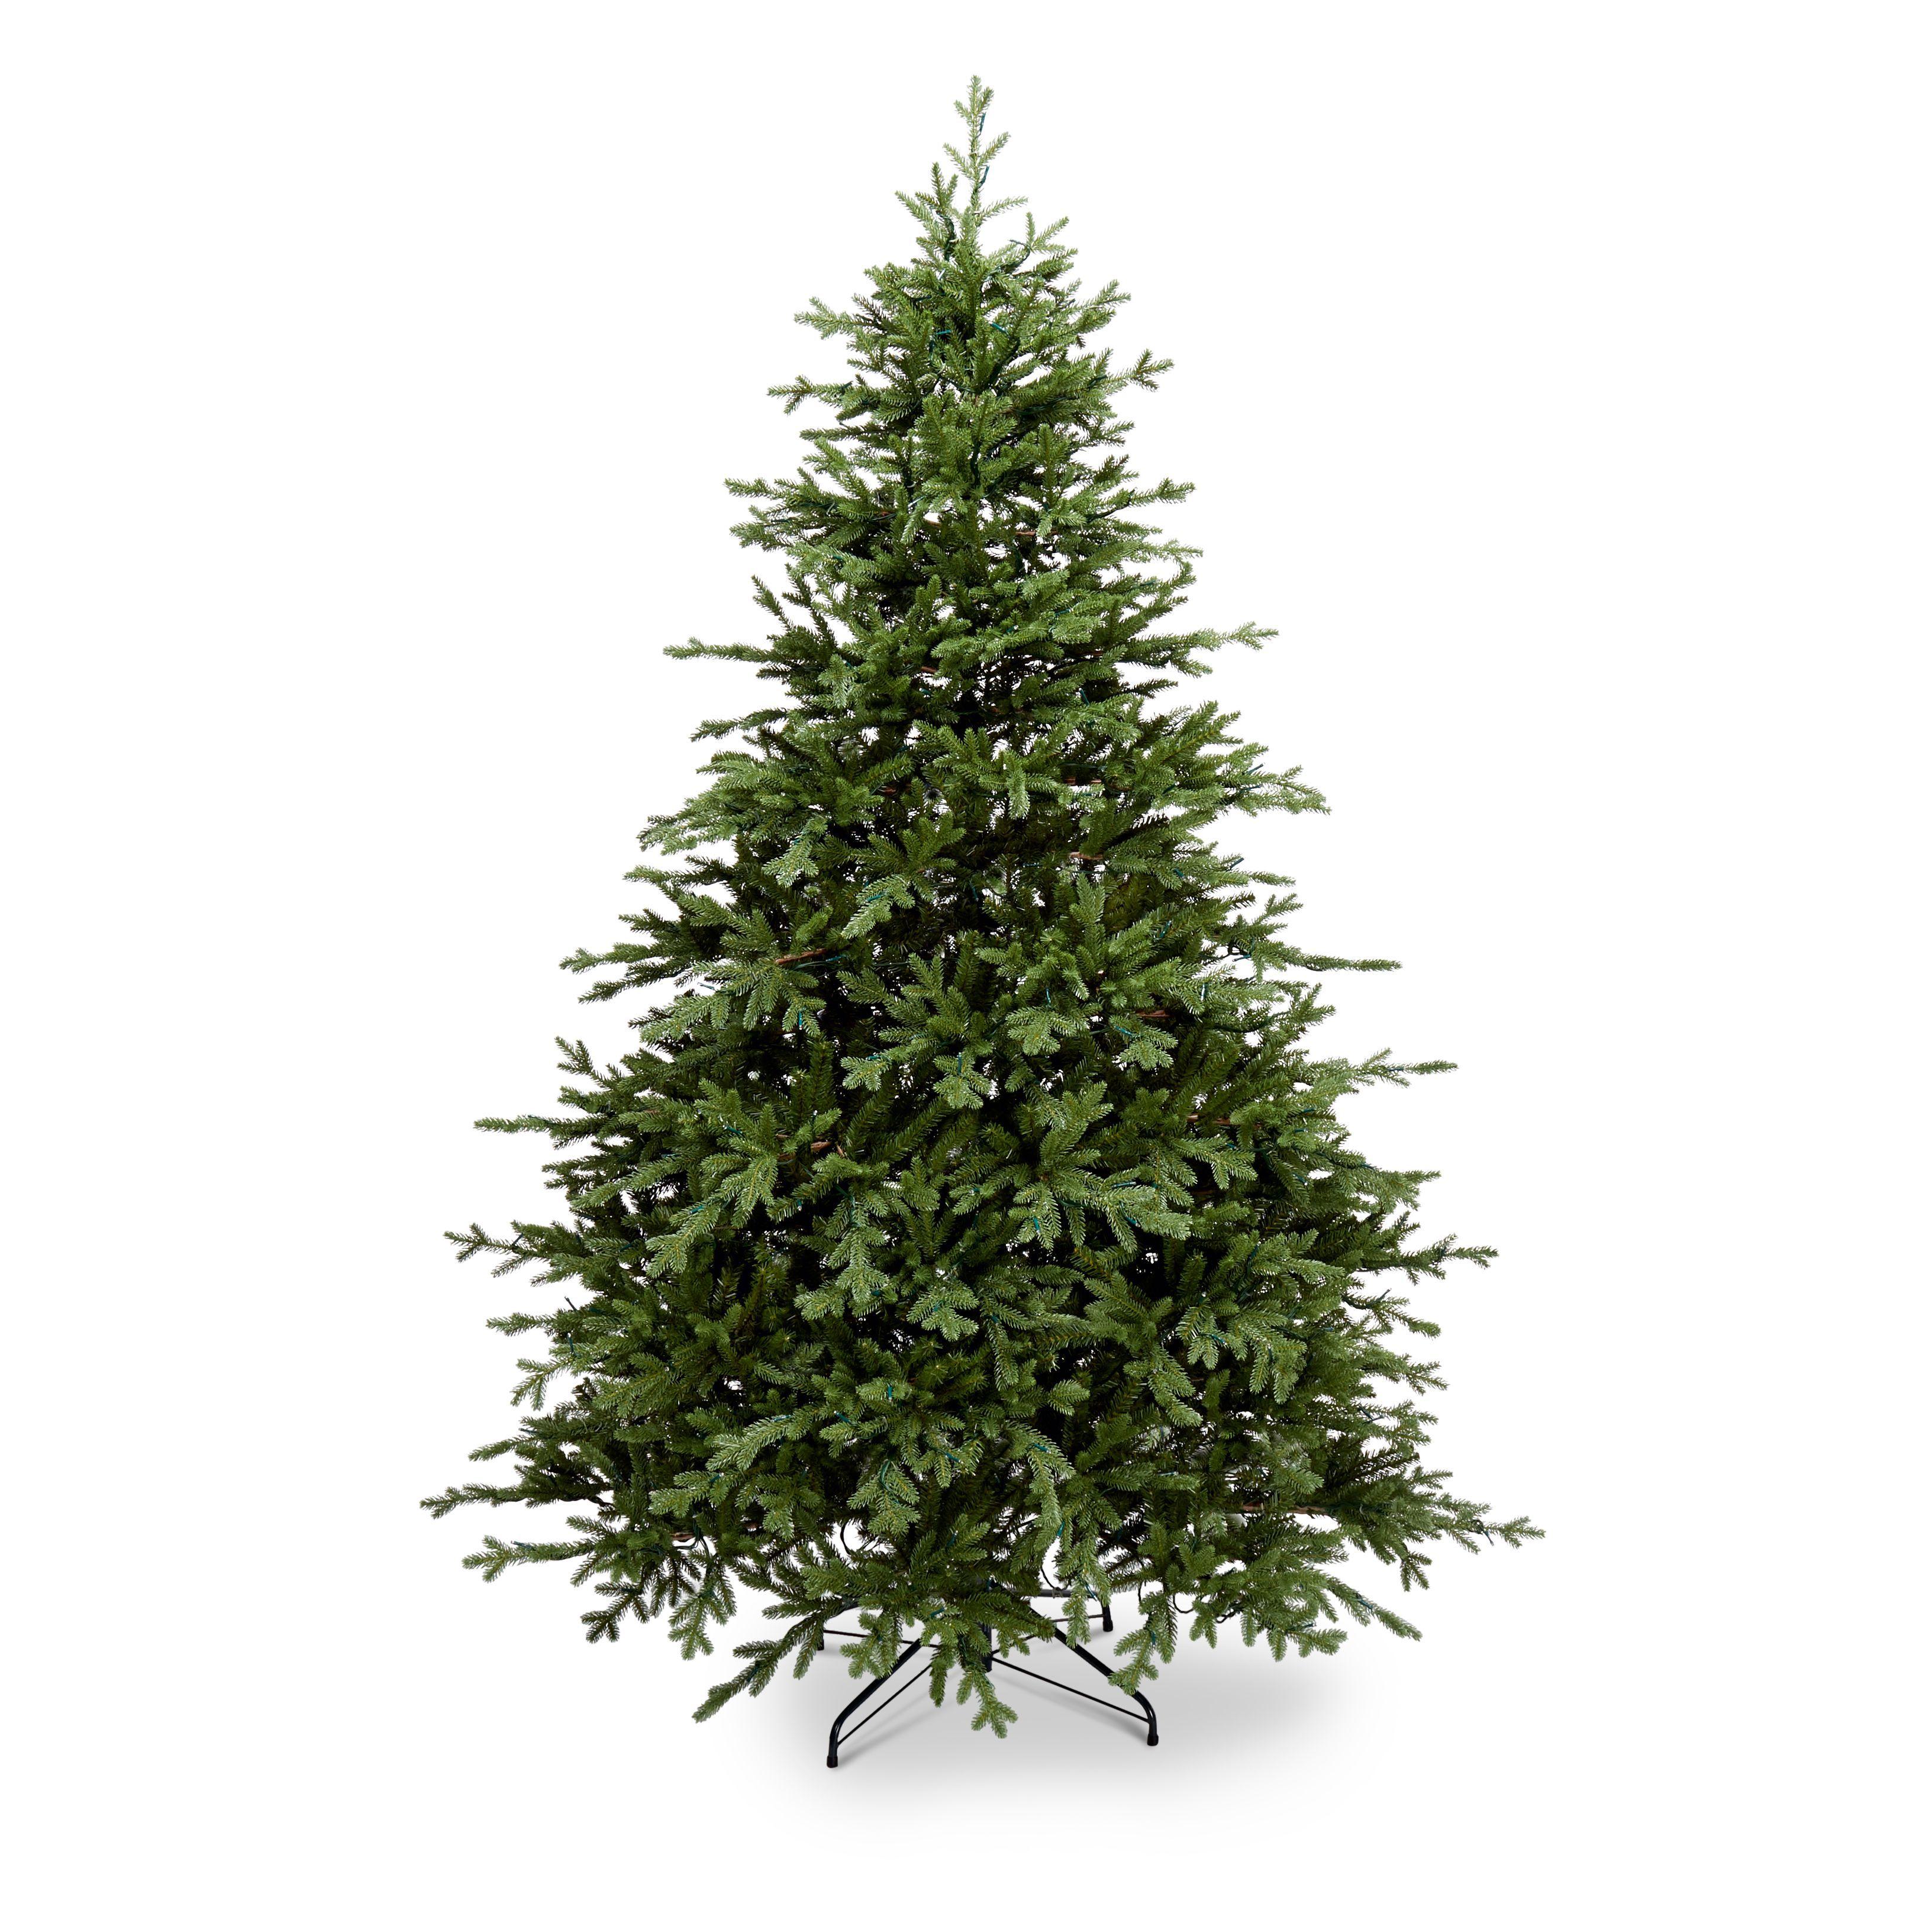 7 5 Ft Thetford Pre Lit Led Christmas Tree Departments Diy At B Q